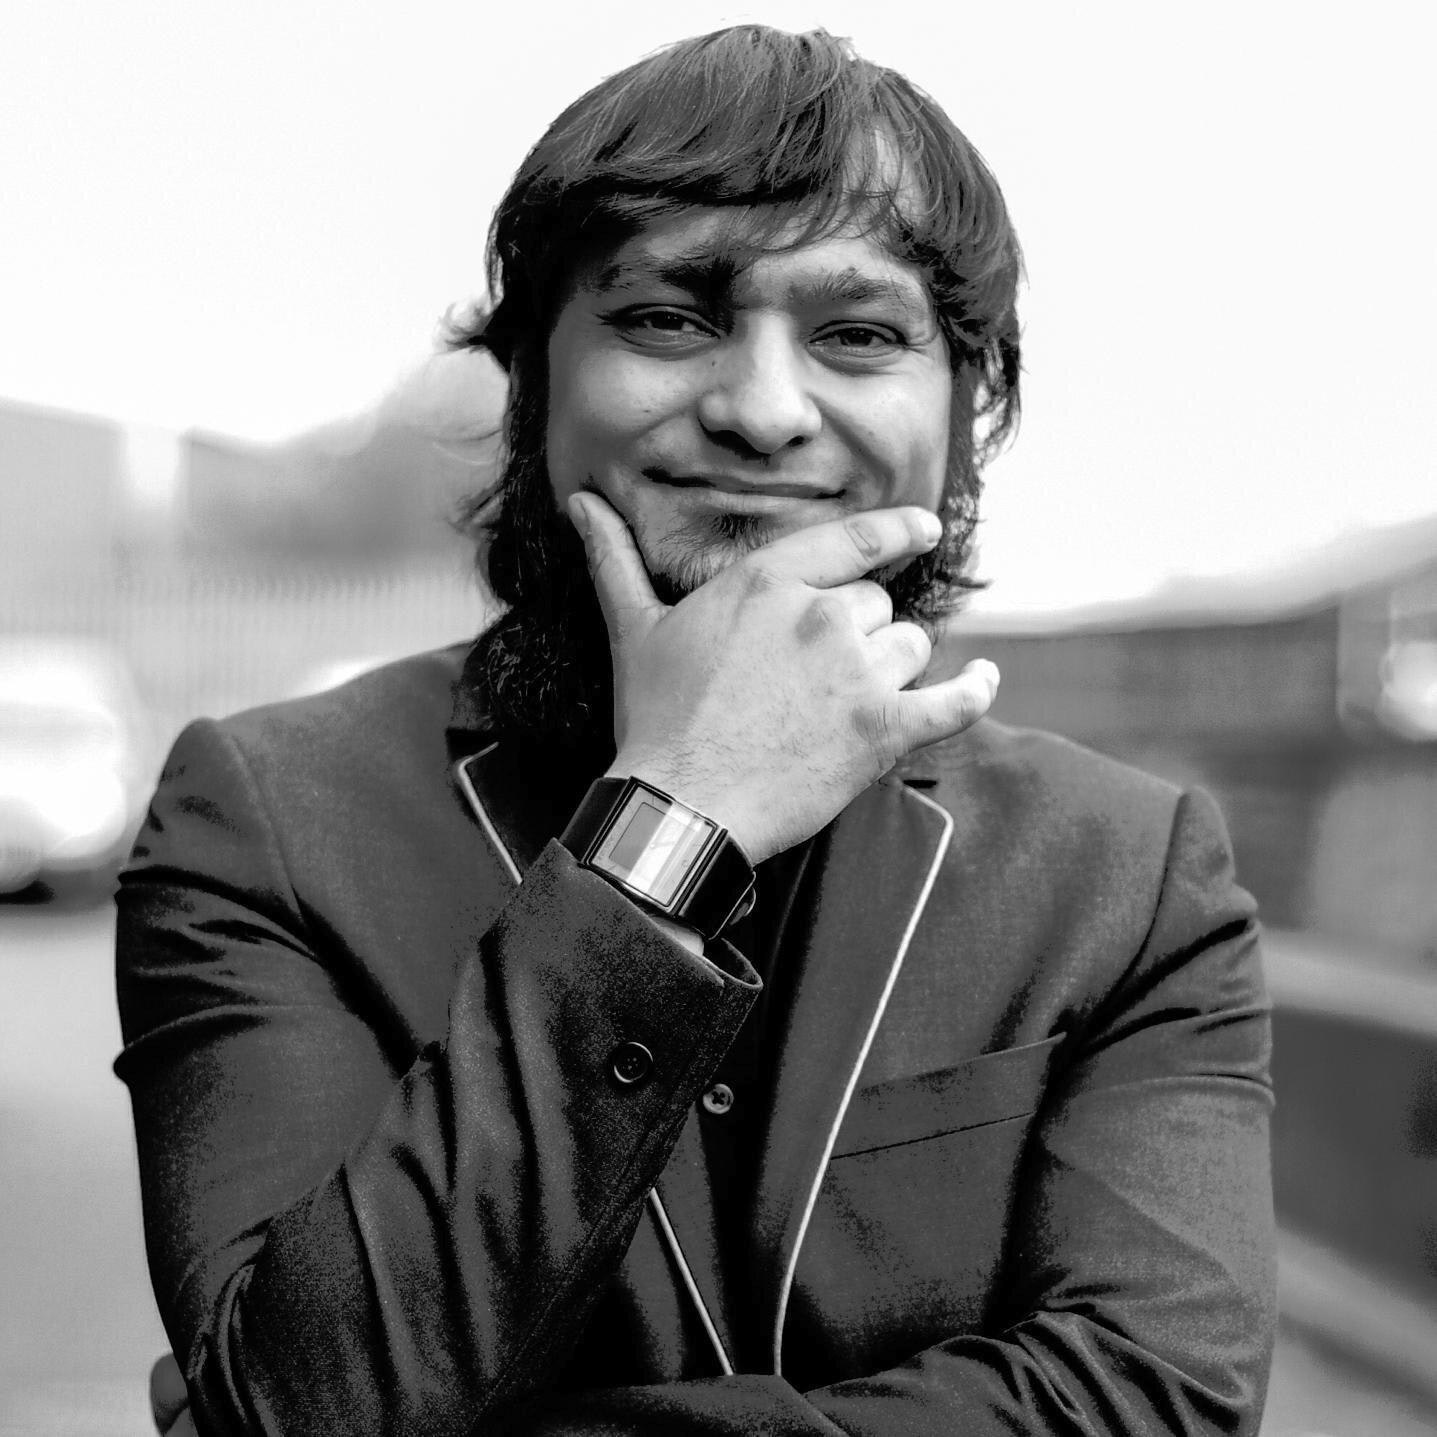 Azzam Sheikh